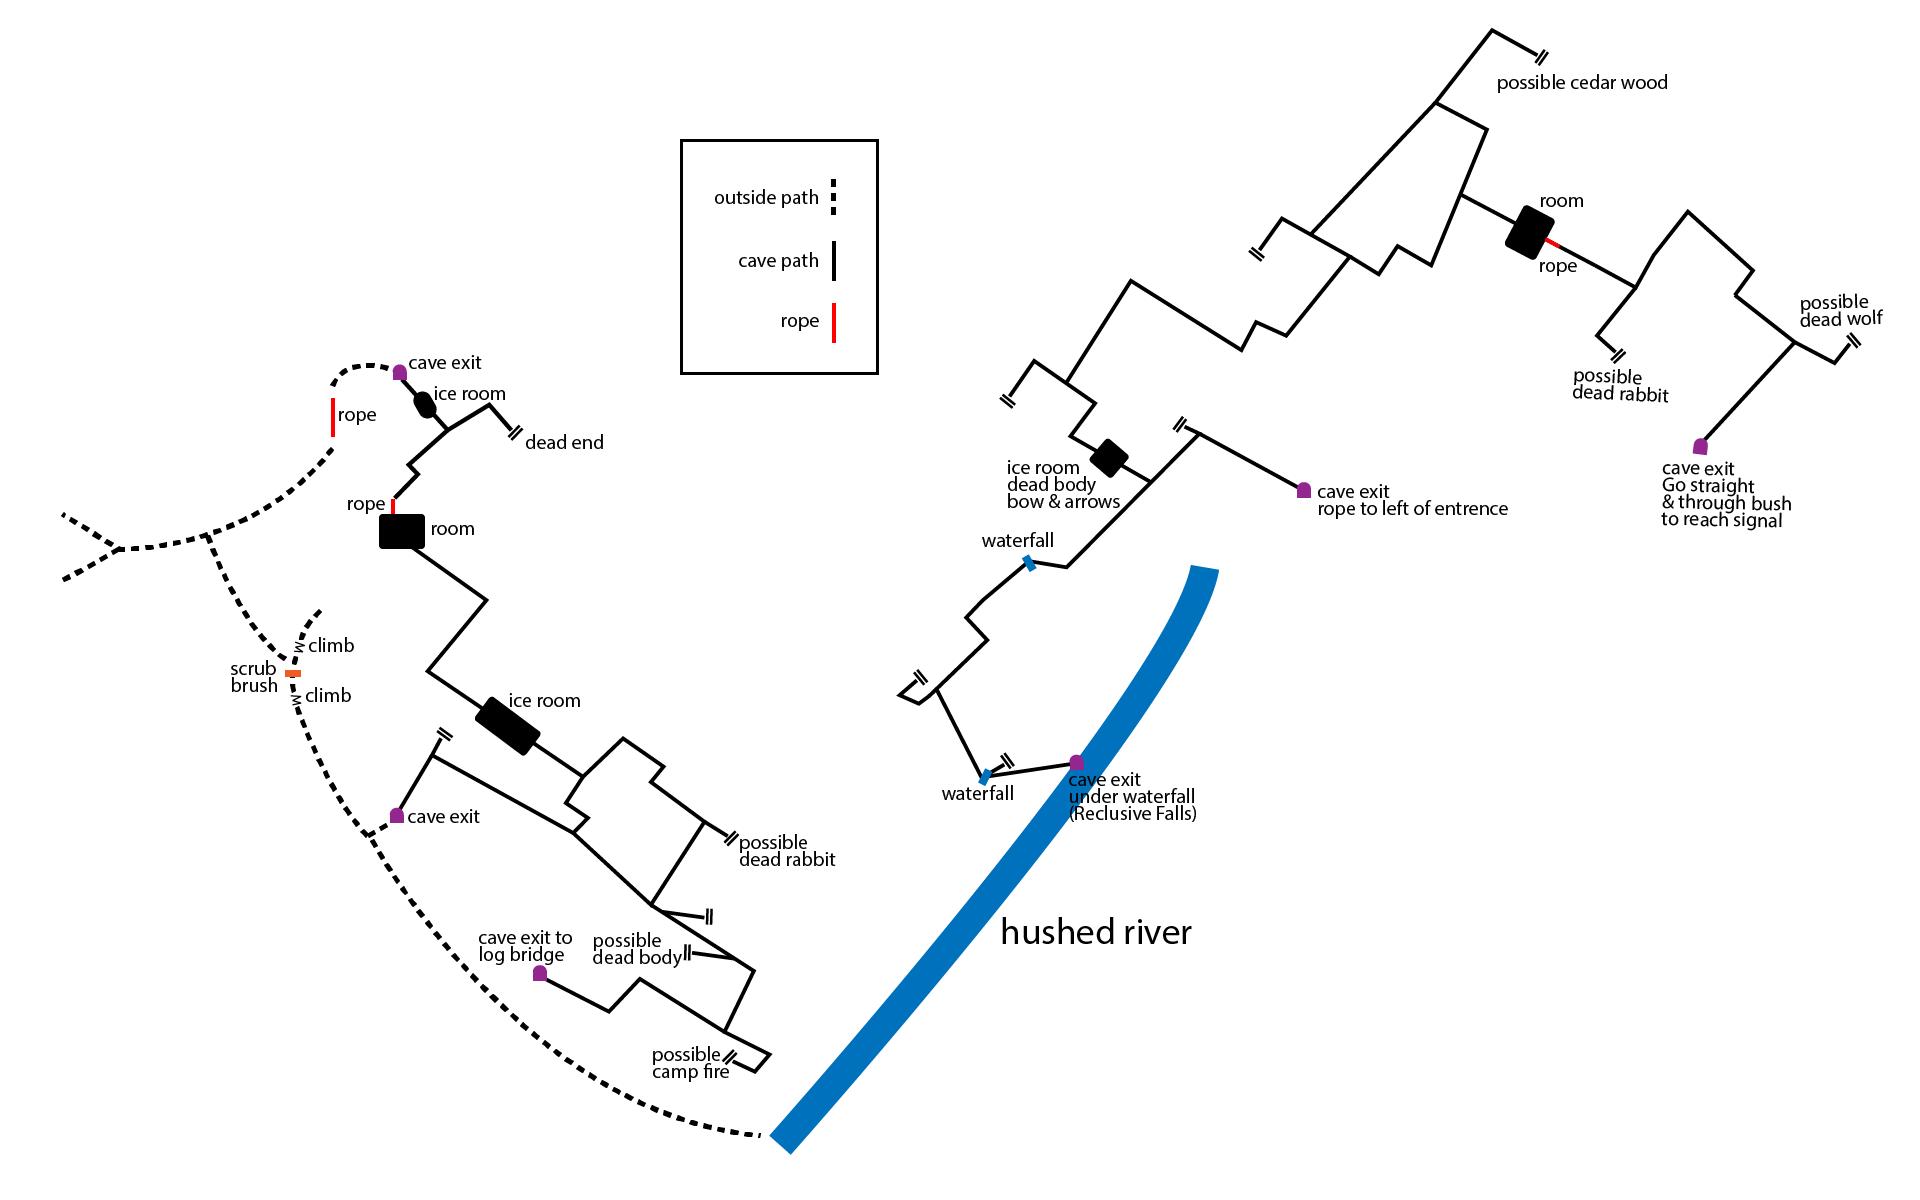 Ice cave | The Long Dark Wiki | FANDOM powered by Wikia